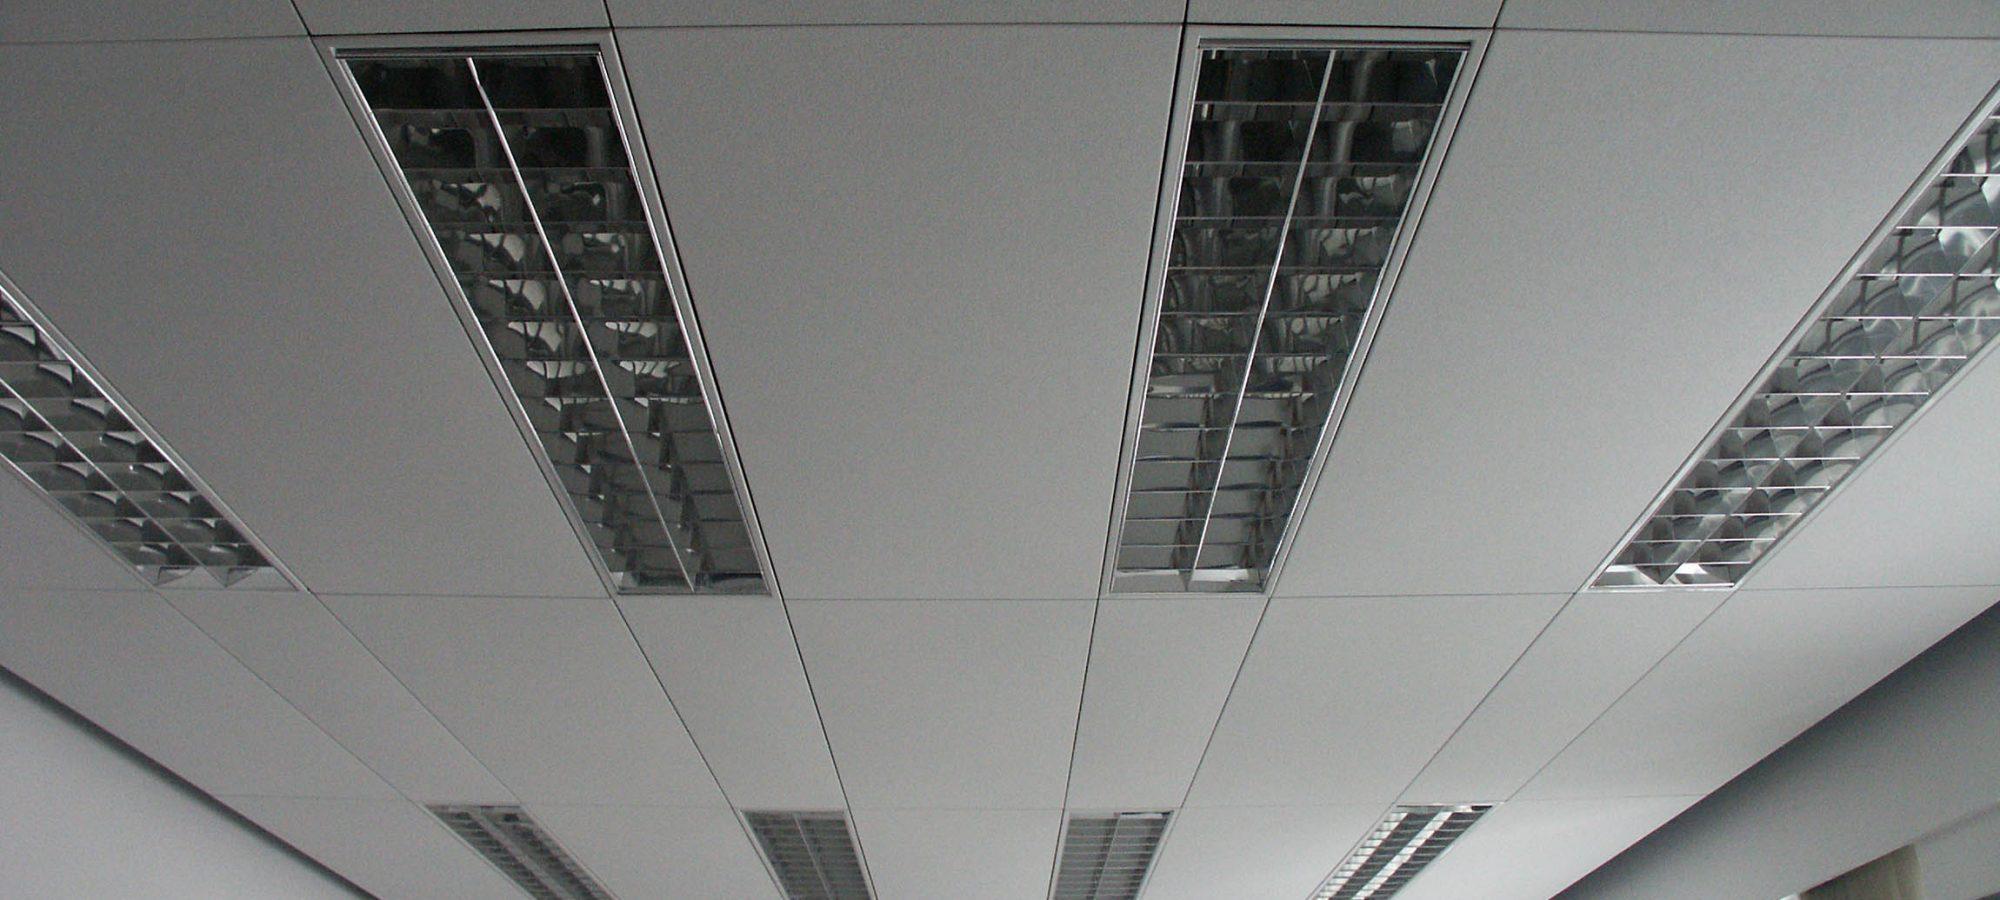 sf-_0024_System 110